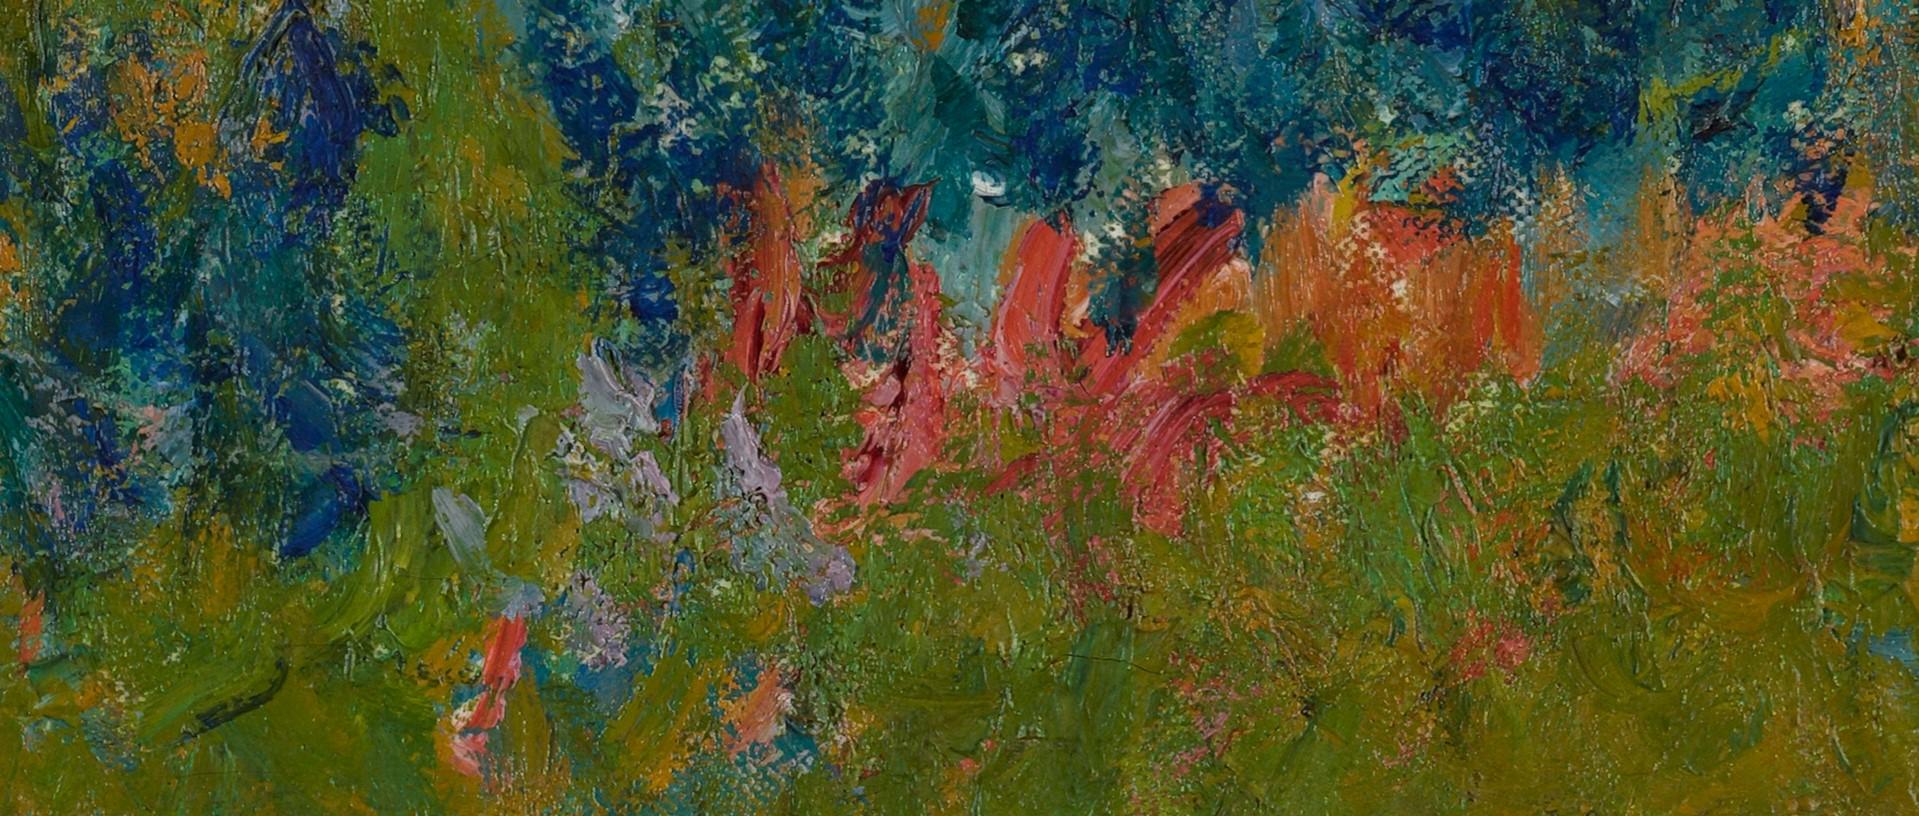 Анри Море Henri Moret художник картина пейзажи природы Альберт Сафиуллин